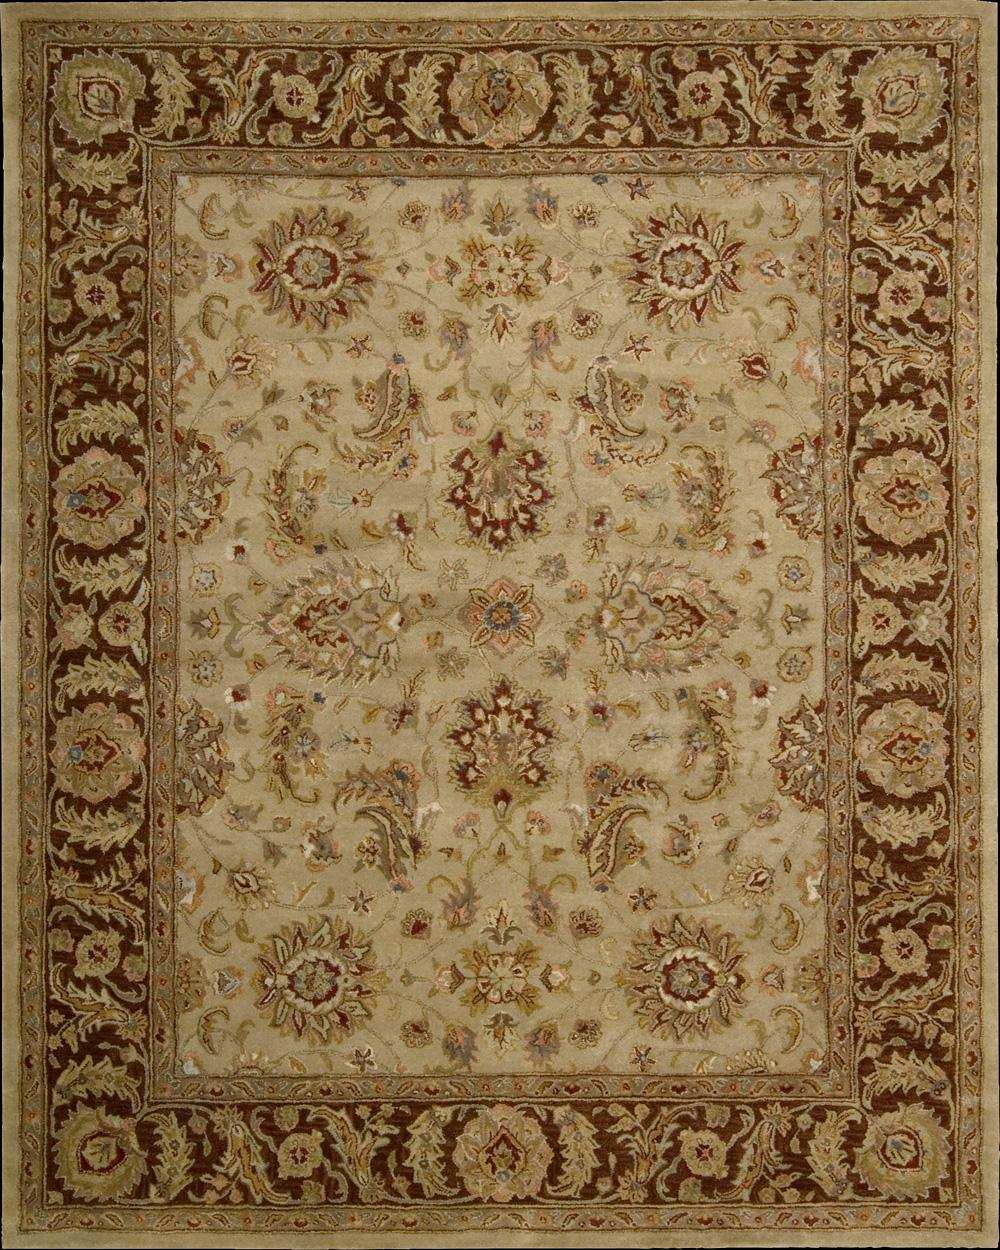 "Nourison Jaipur Area Rug 7'9"" x 9'9"" - Item Number: 85677"